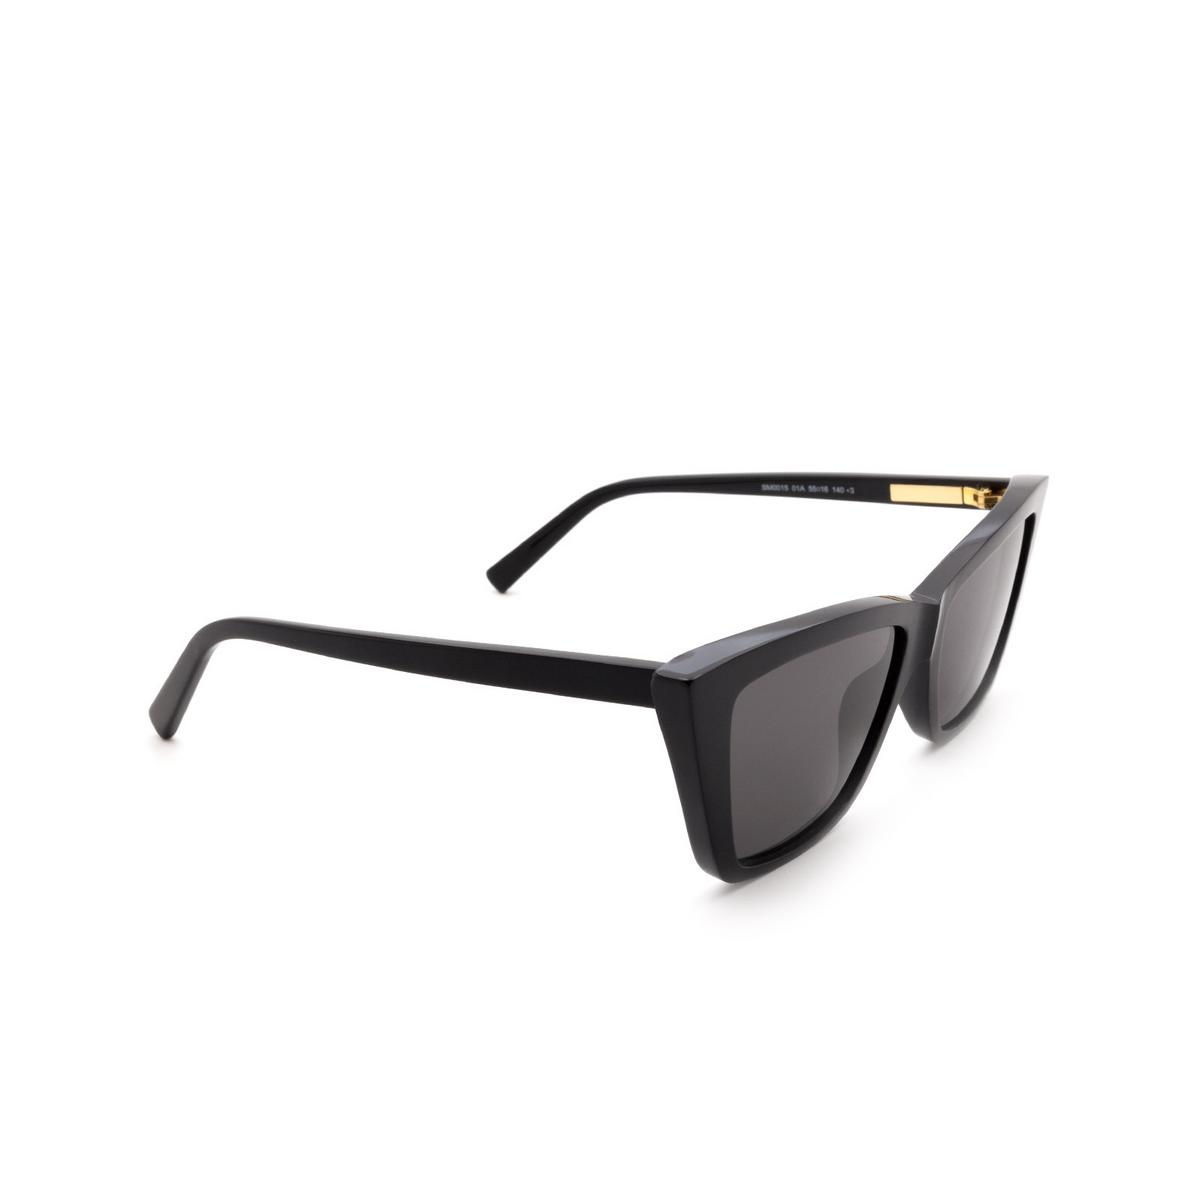 Sportmax® Butterfly Sunglasses: SM0015 color Shiny Black 01A - three-quarters view.